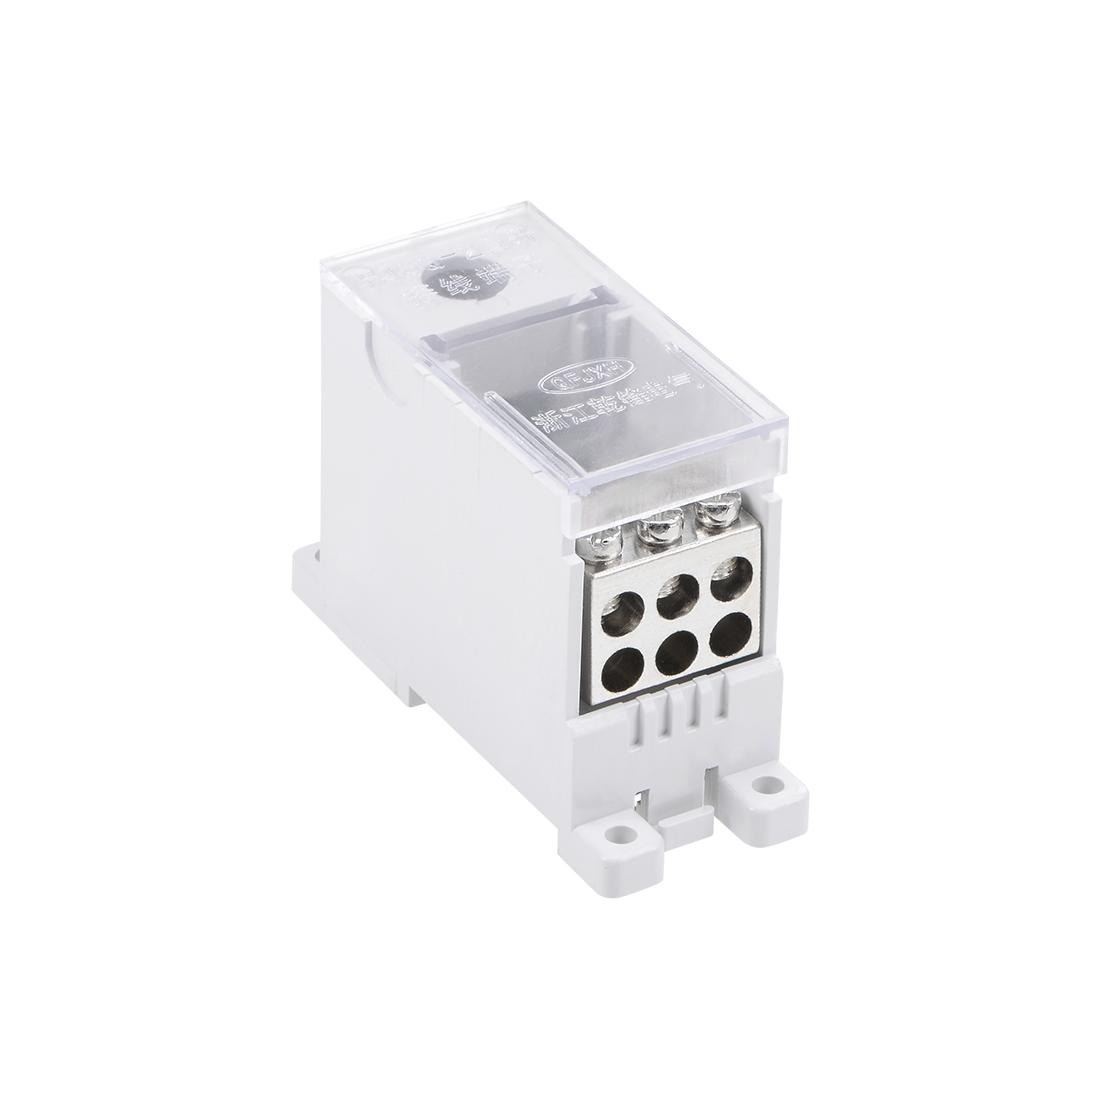 1 Input 6 Output DIN Rail Terminal Blocks Connectors Distribution Block